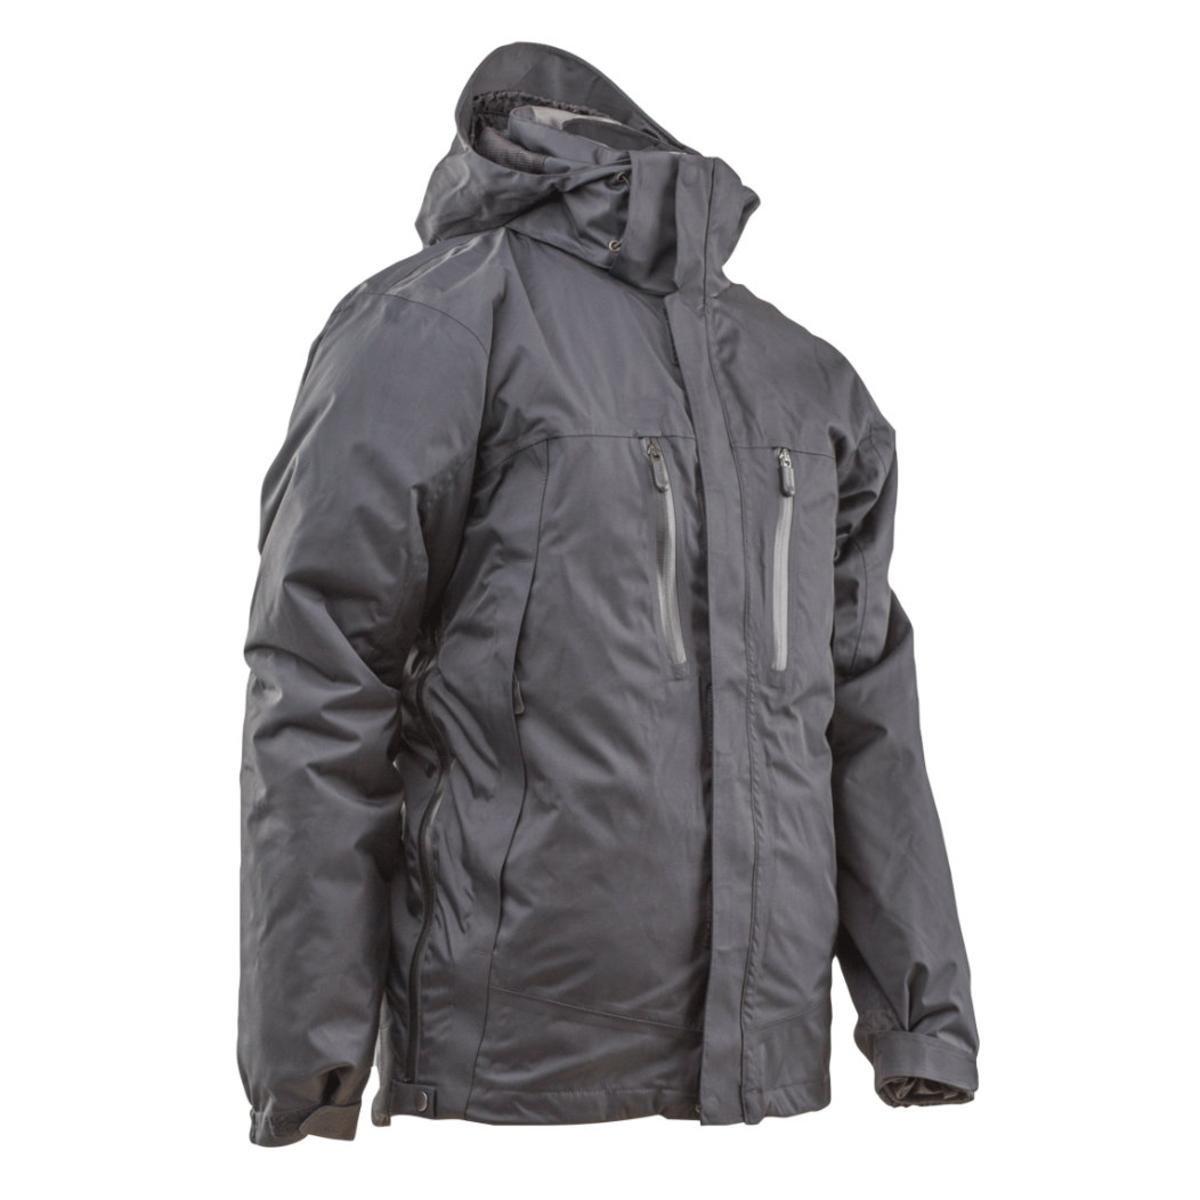 Tru-Spec Men's H2o Proof Element Jacket - 2502 at Amazon Men's ...